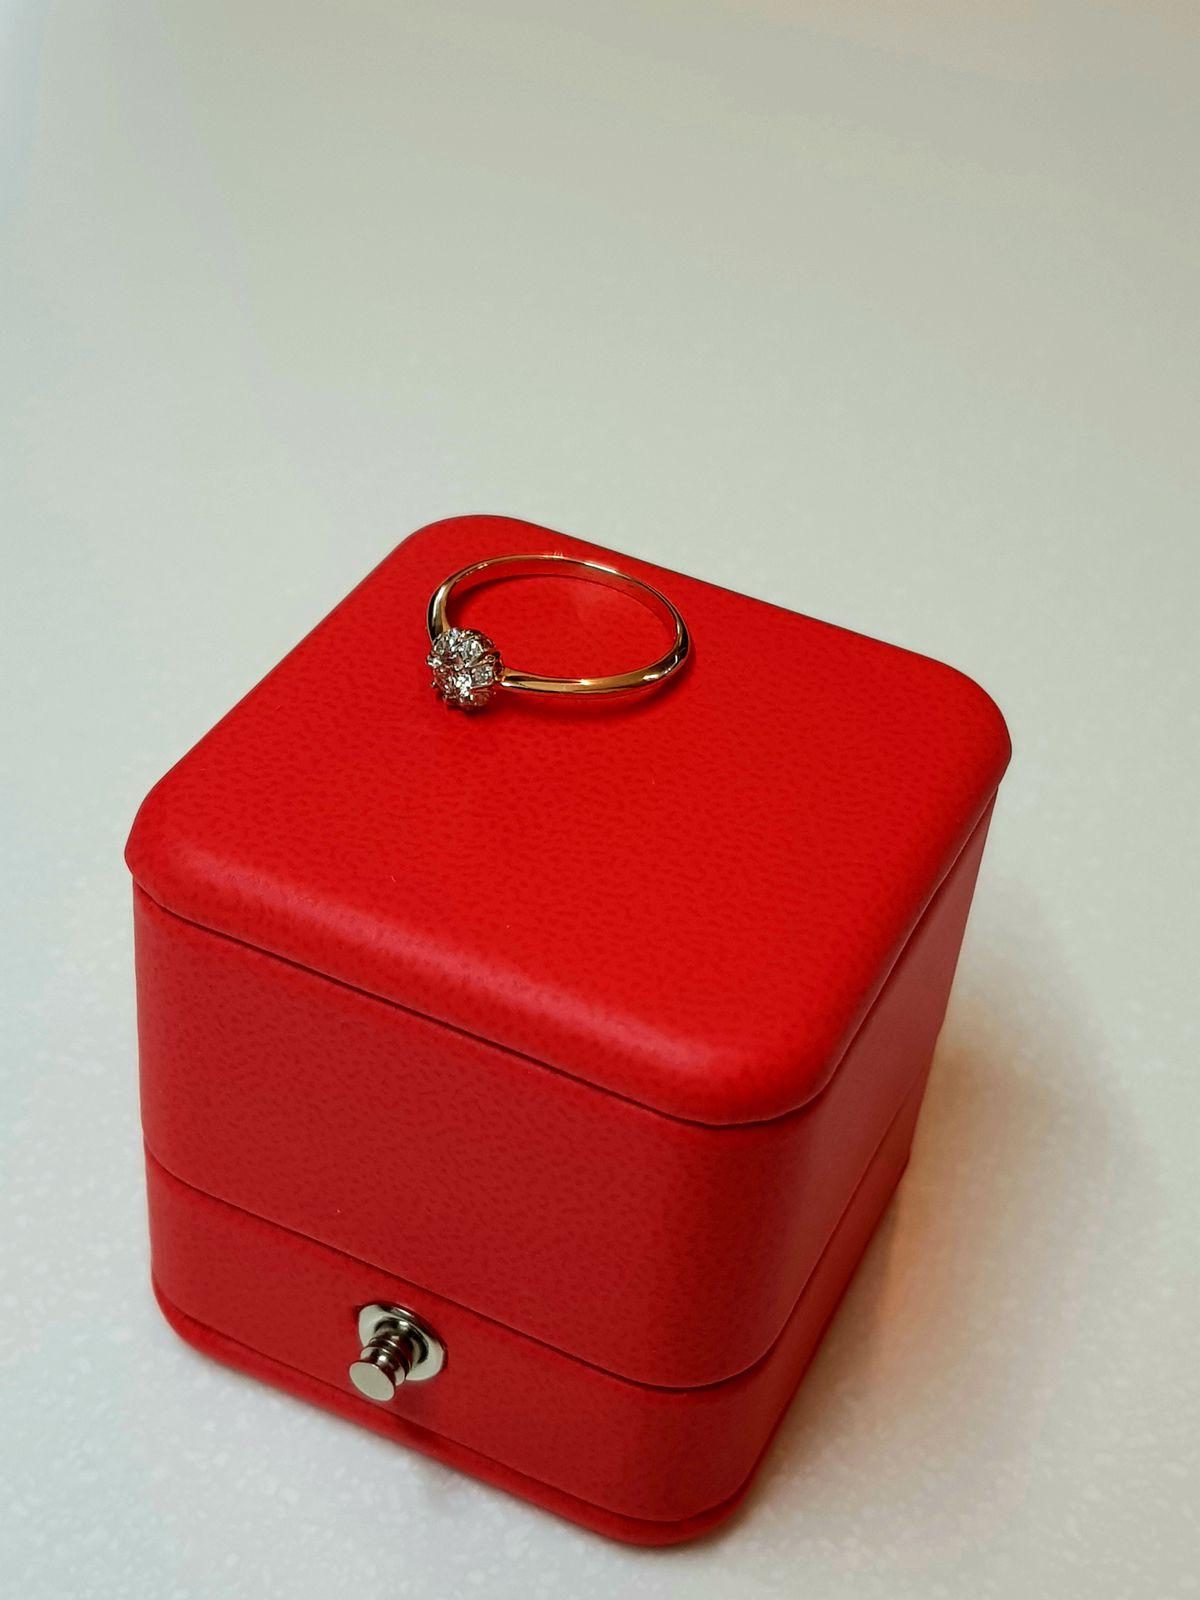 Прелестное кольцо с бриллиантами